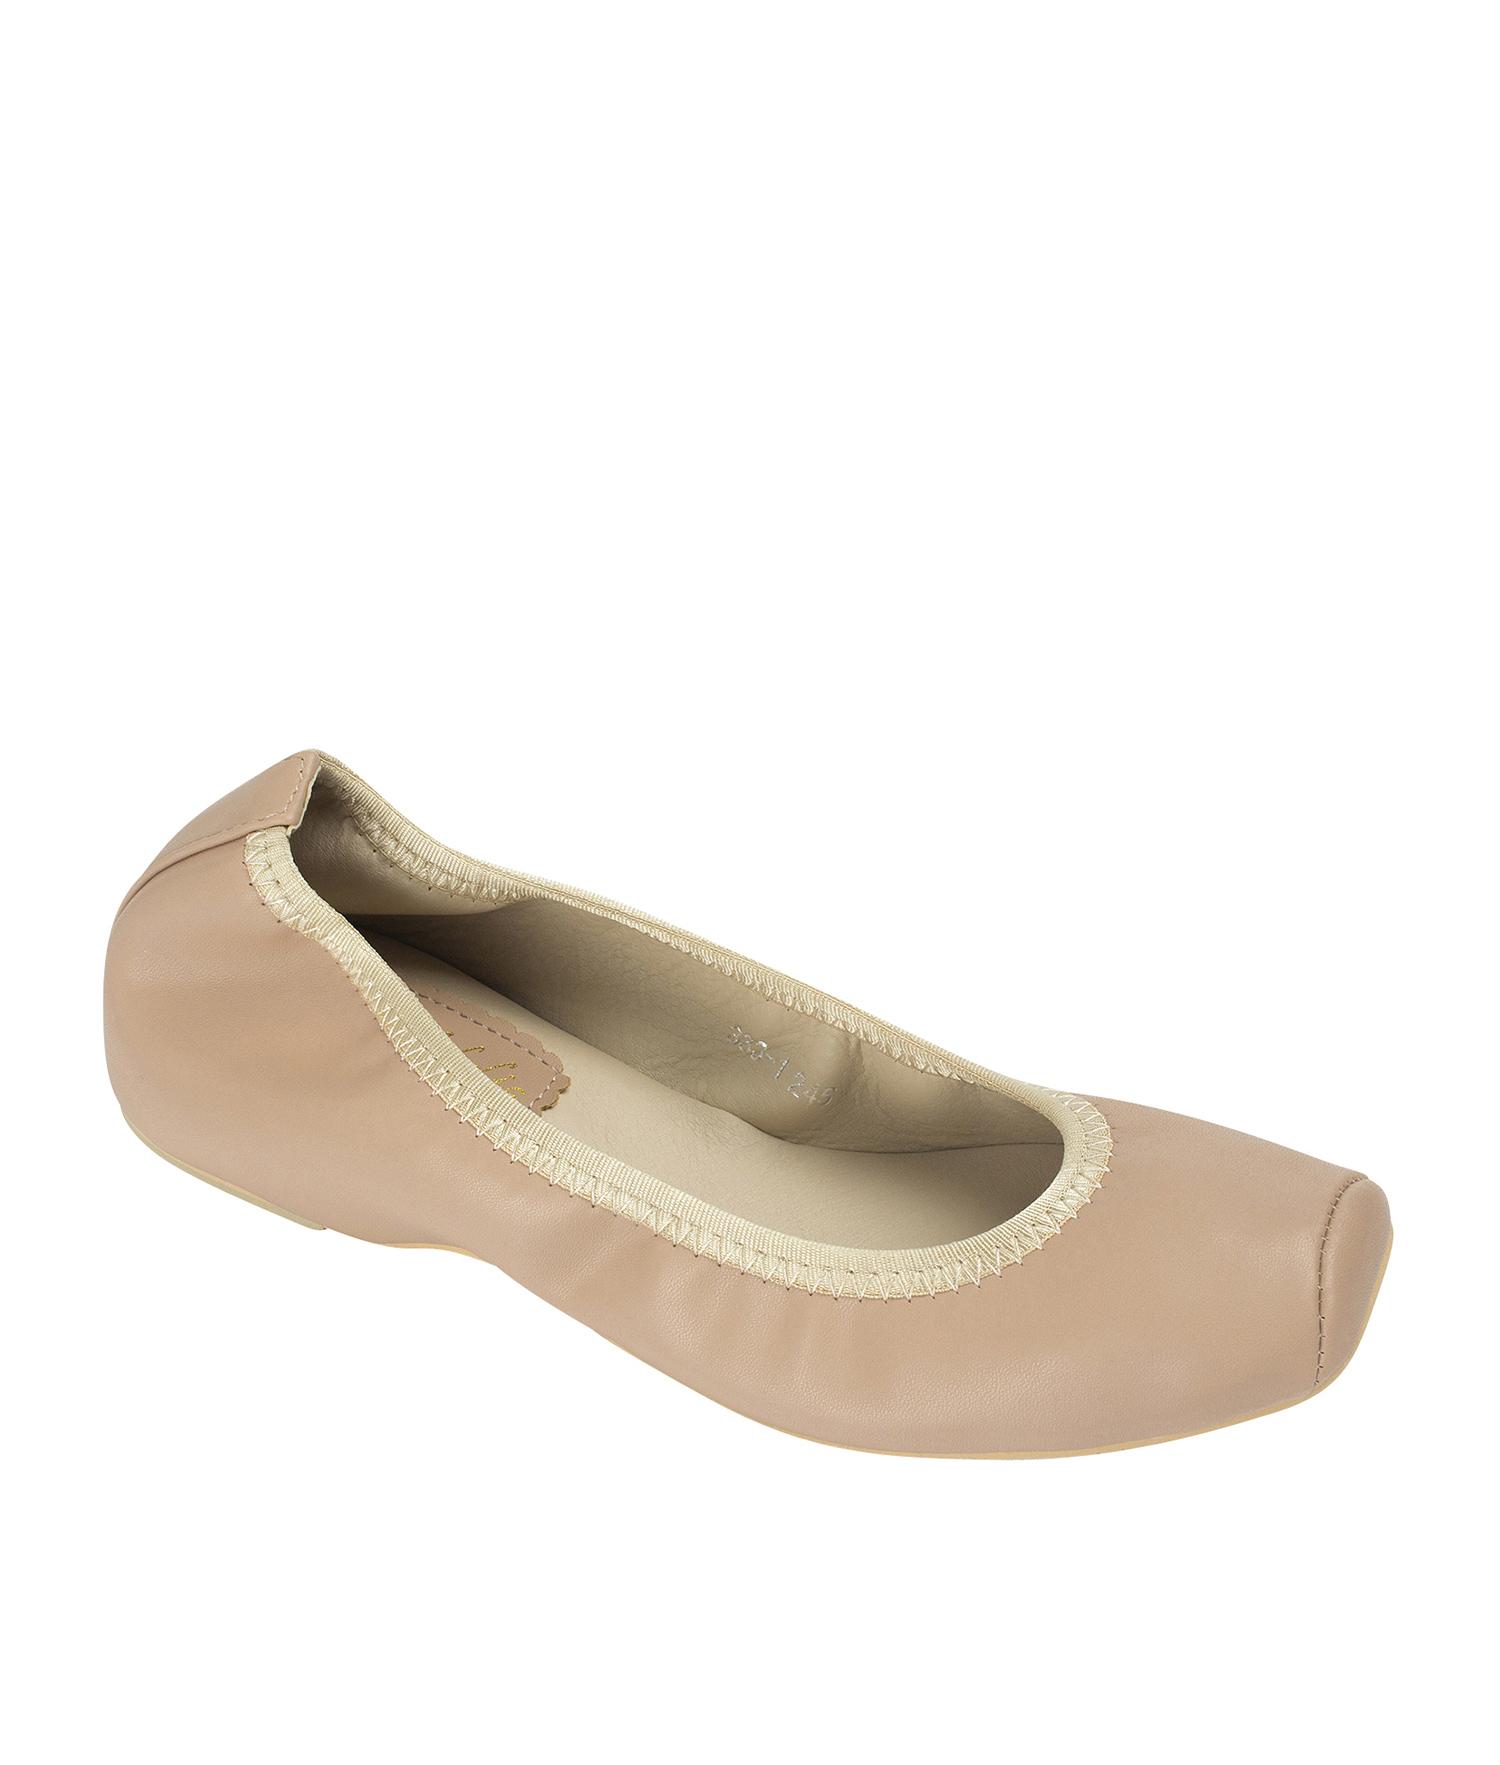 Ballet shoes nude Nude Photos